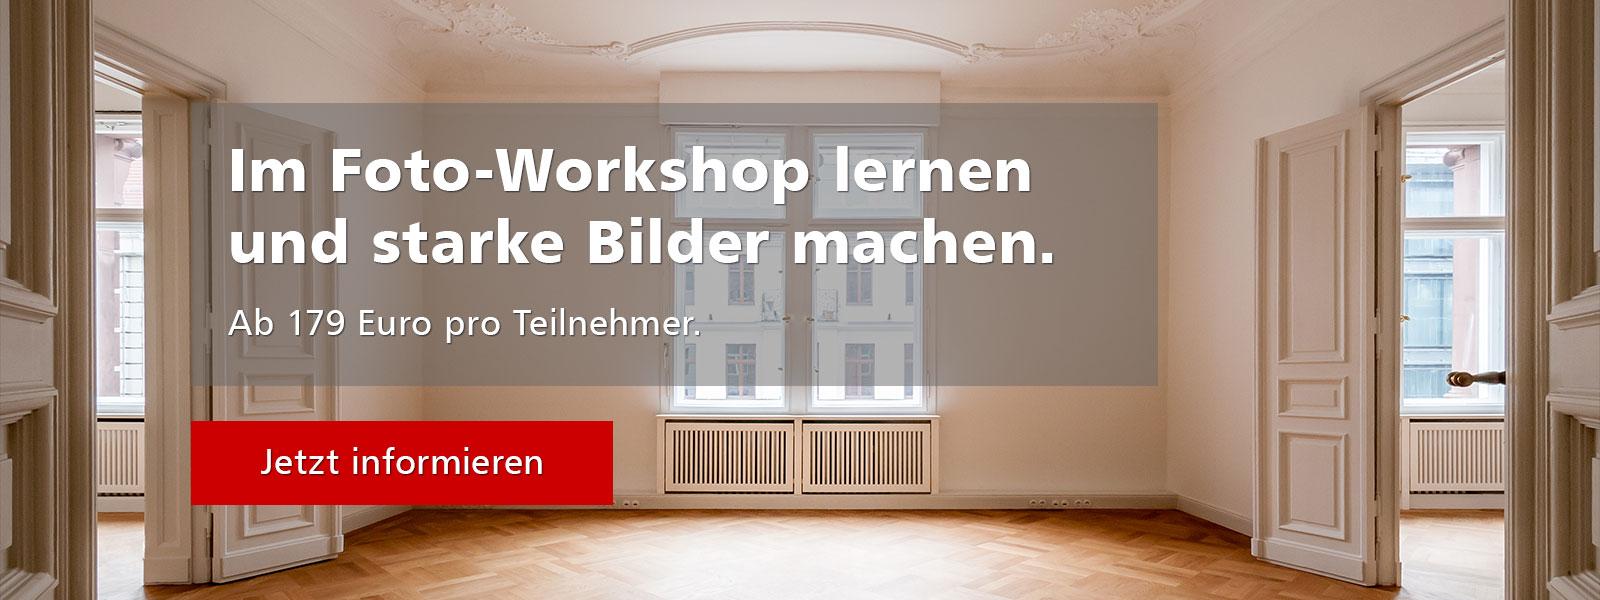 Workshop Immobilienfotografie ab 149 EUR pro Teilnehmer